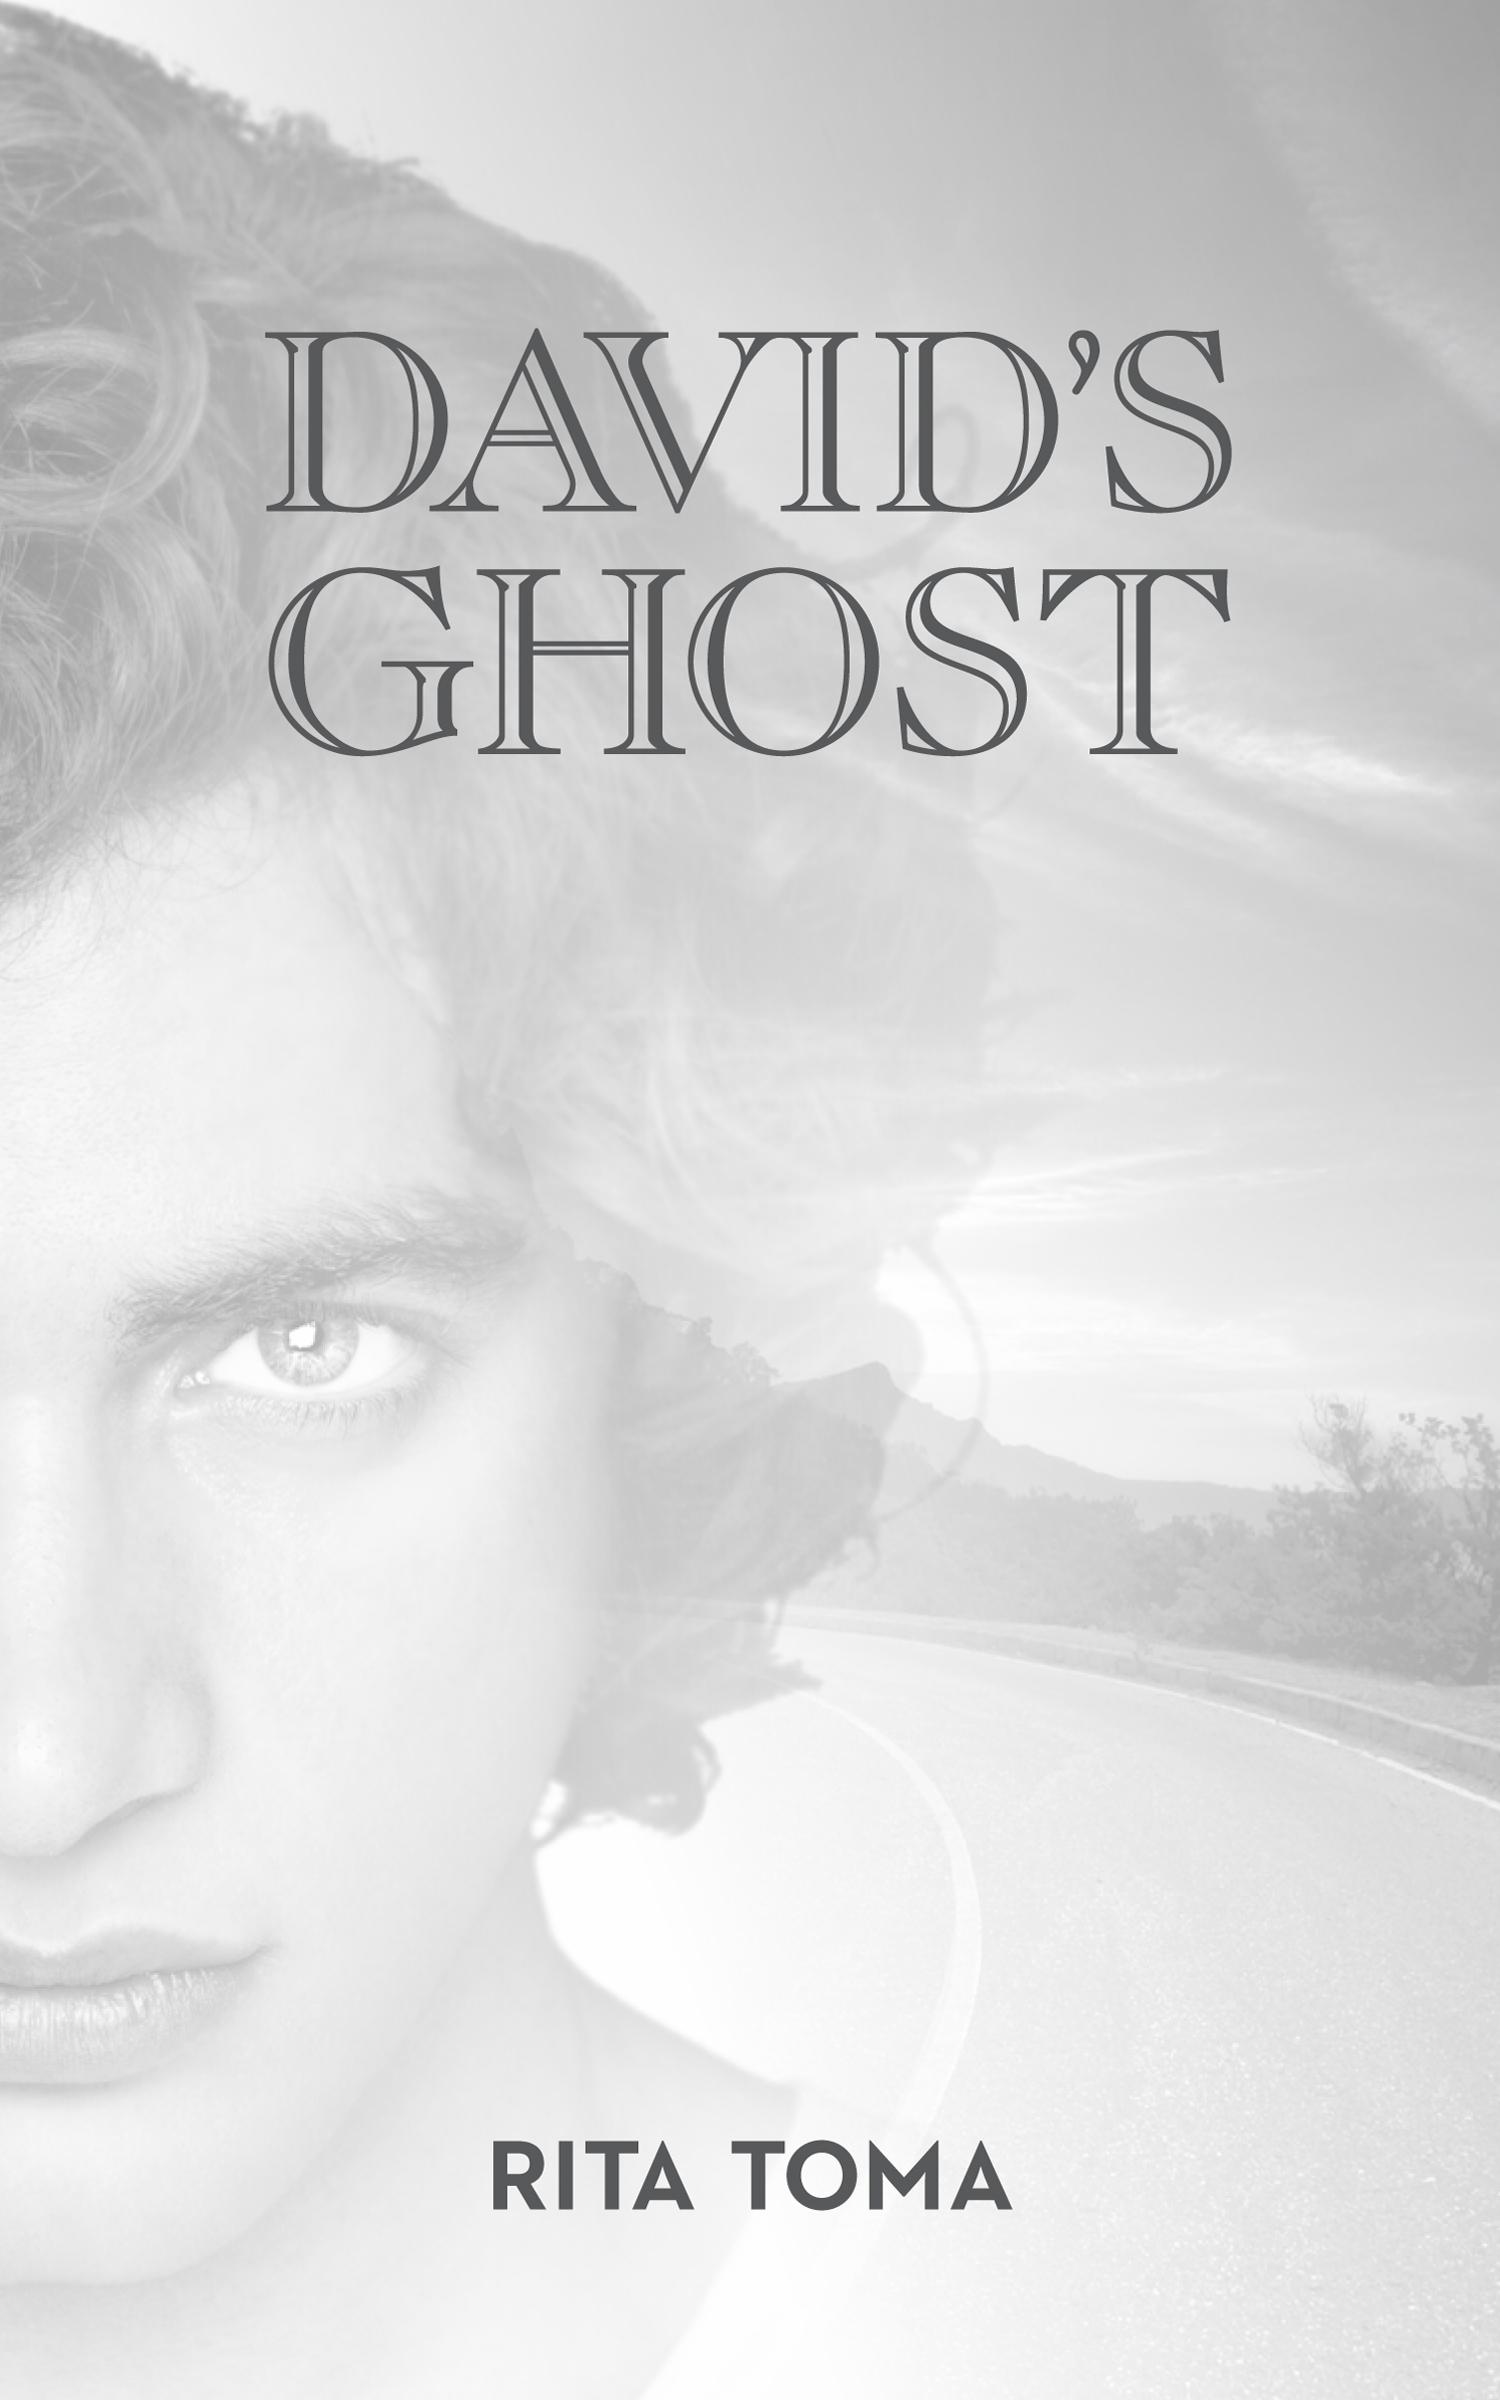 Davids Ghost  by  Rita Toma